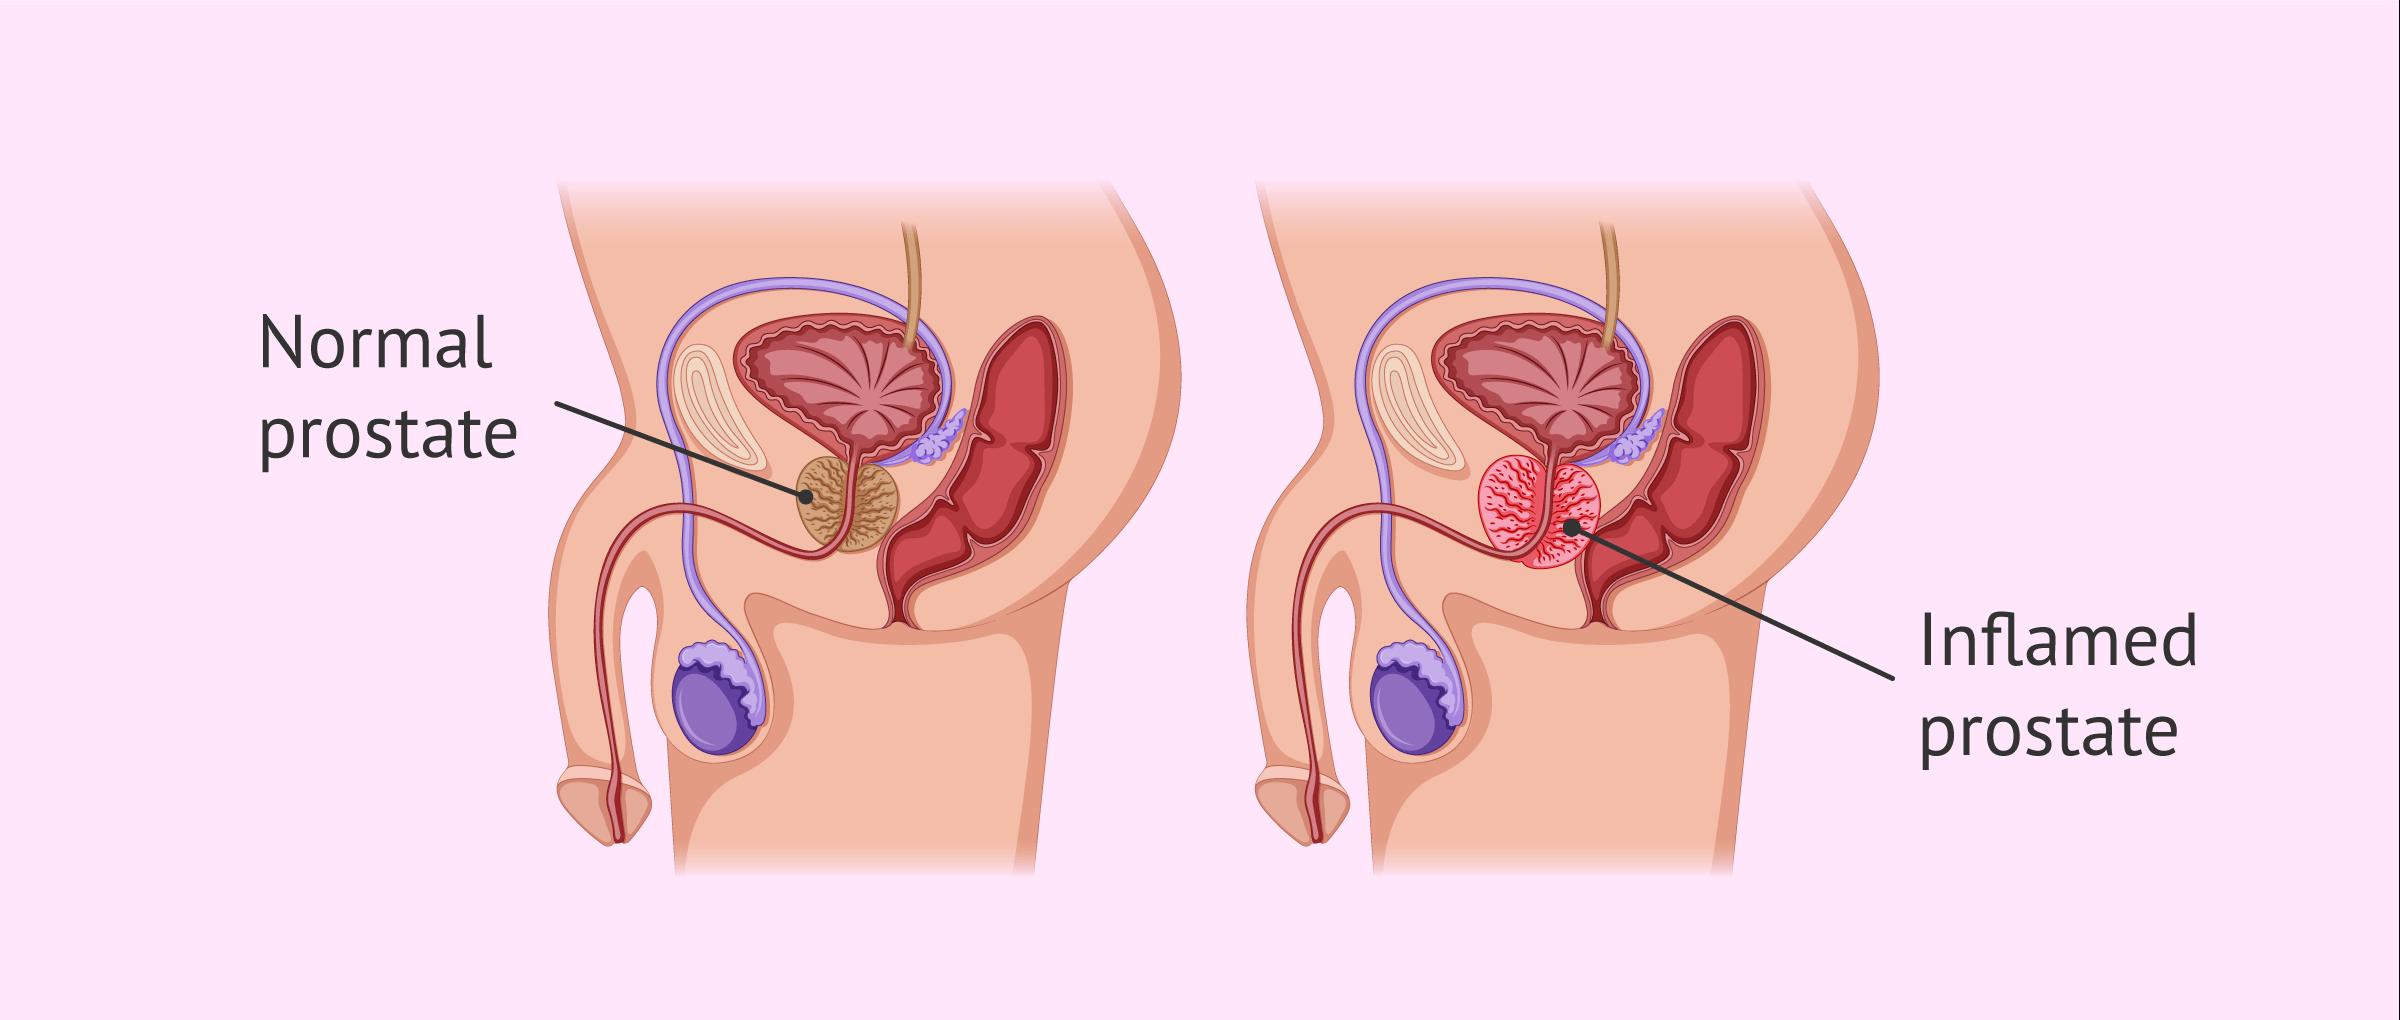 Sugártermelő cystitis prostatitis betegség